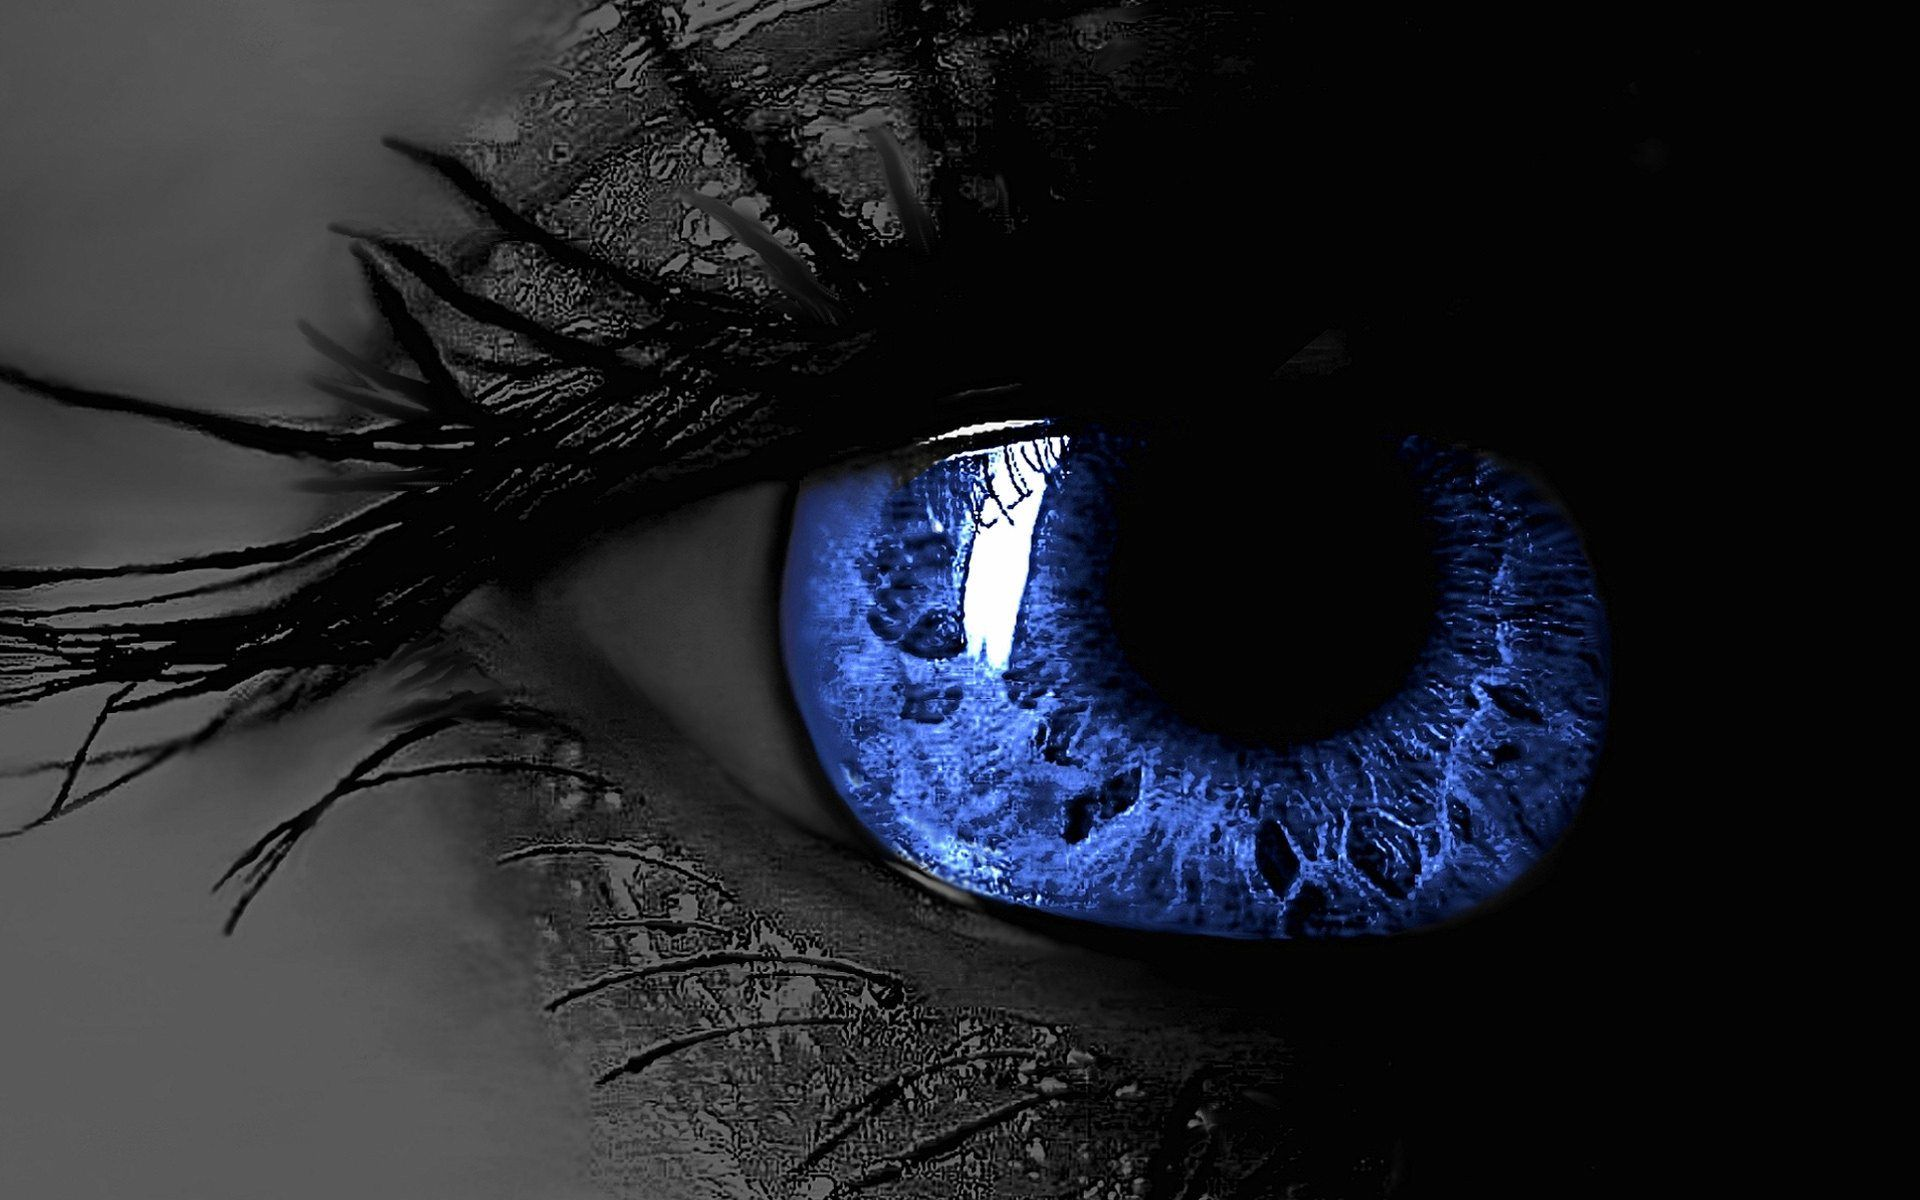 3d Blue Eyes Hd Wallpaper For Desktop Free Download Eyes Wallpaper Crazy Eyes Magic Eyes